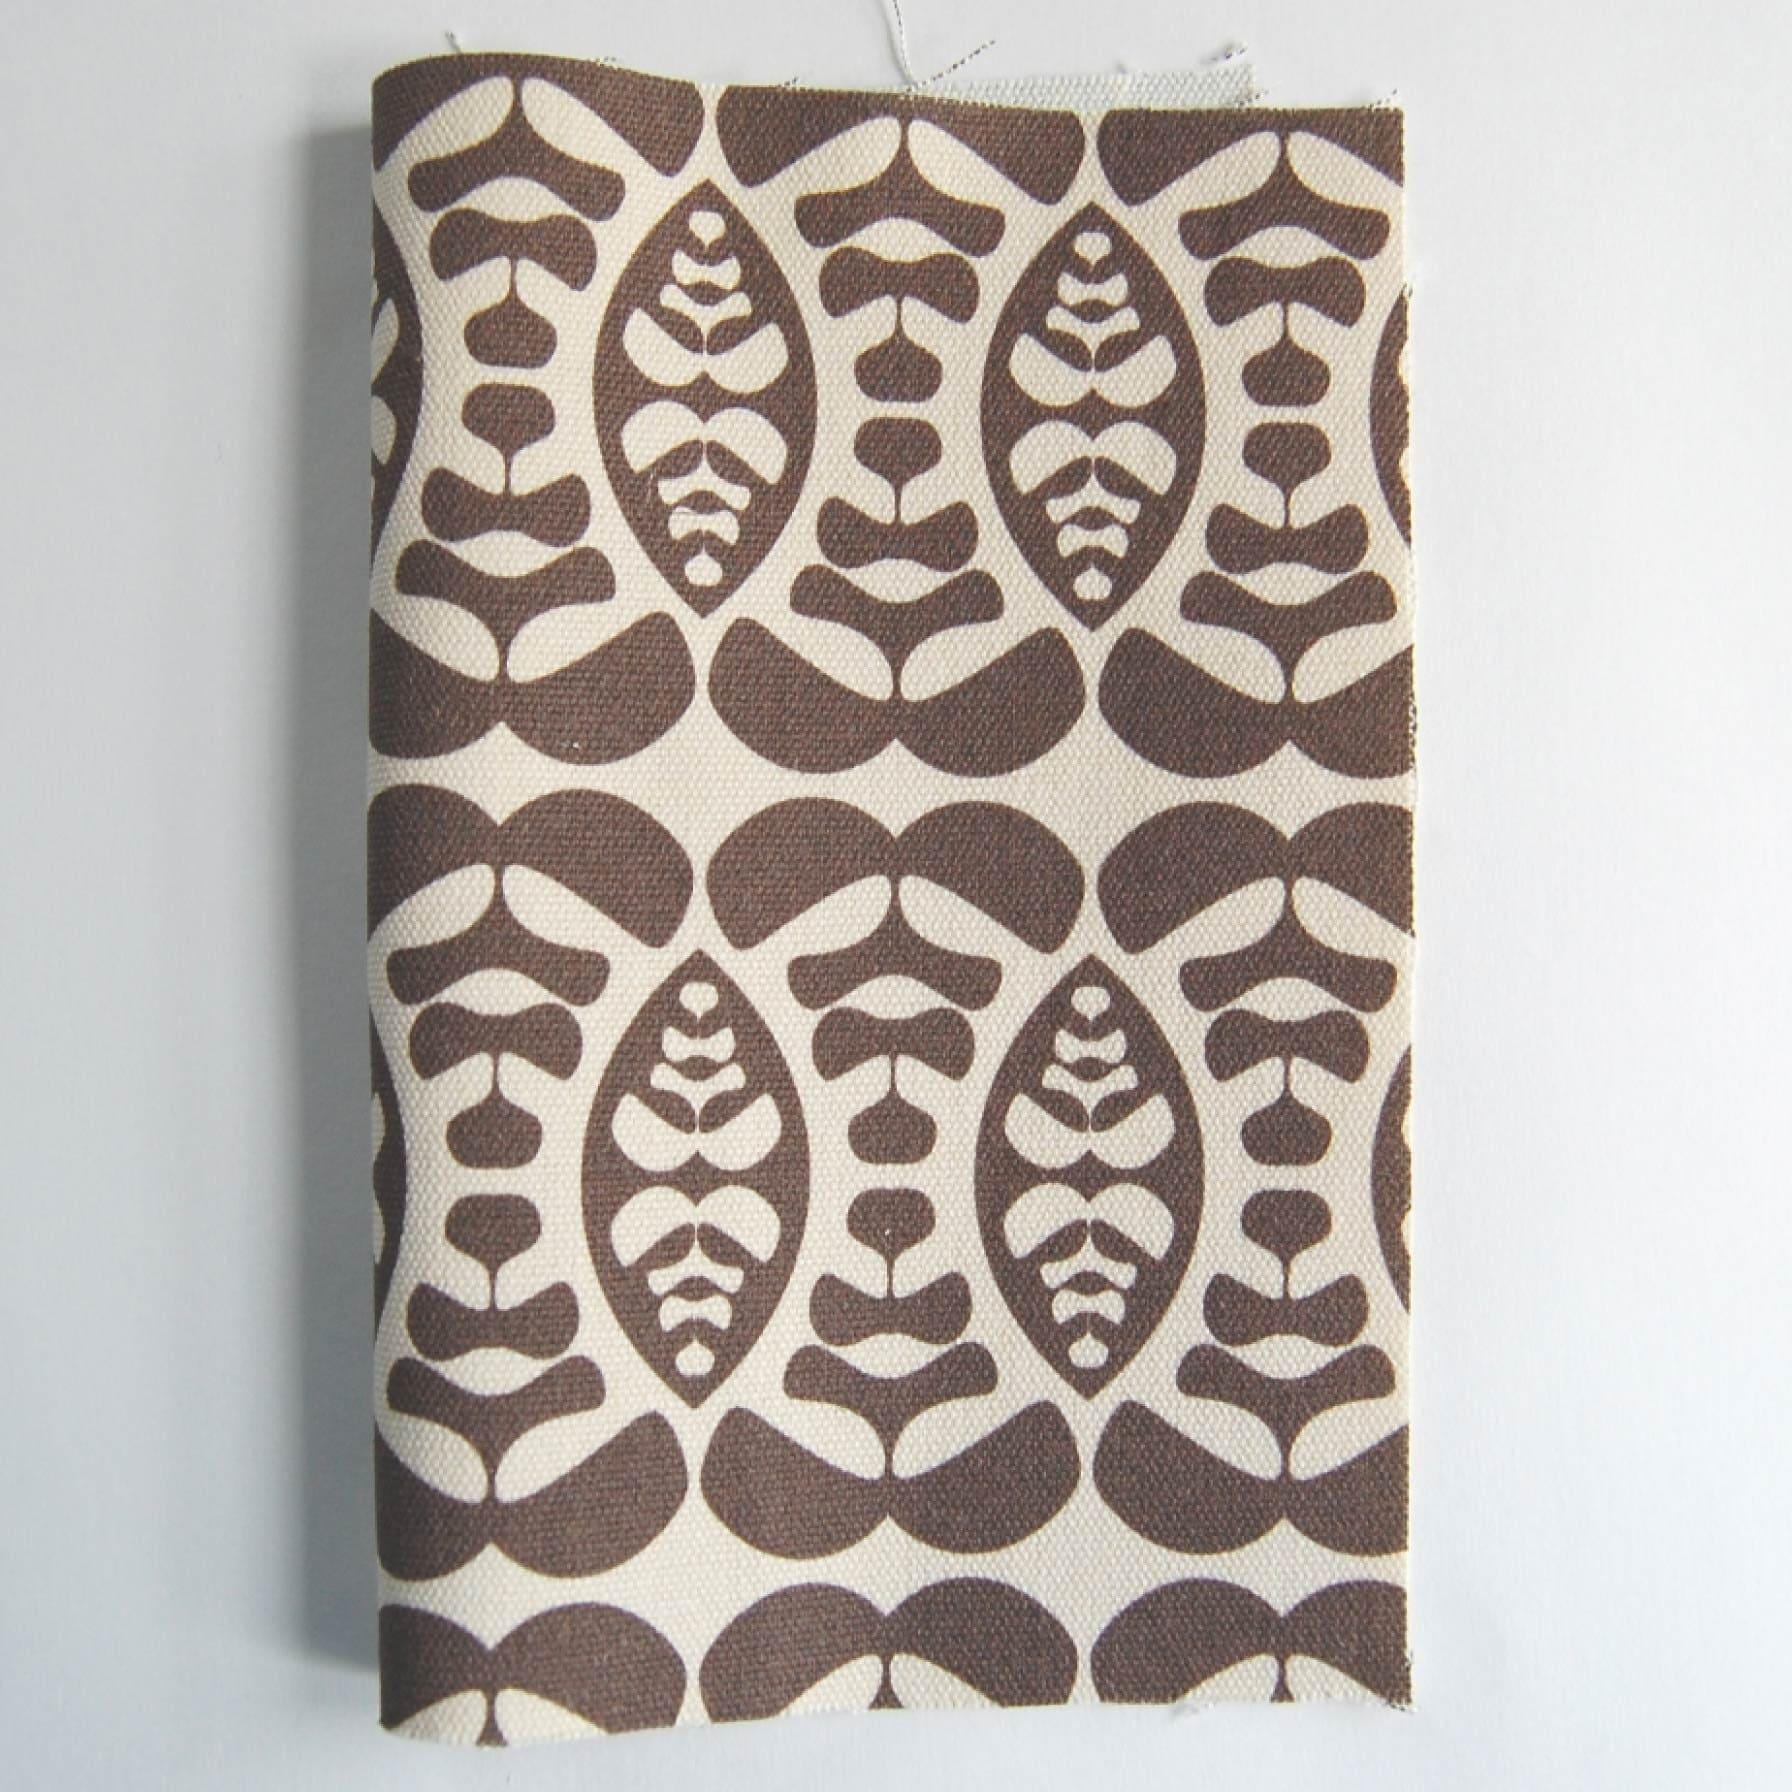 organic canvas fabric remnant - LULU - 9'' x 11.5''